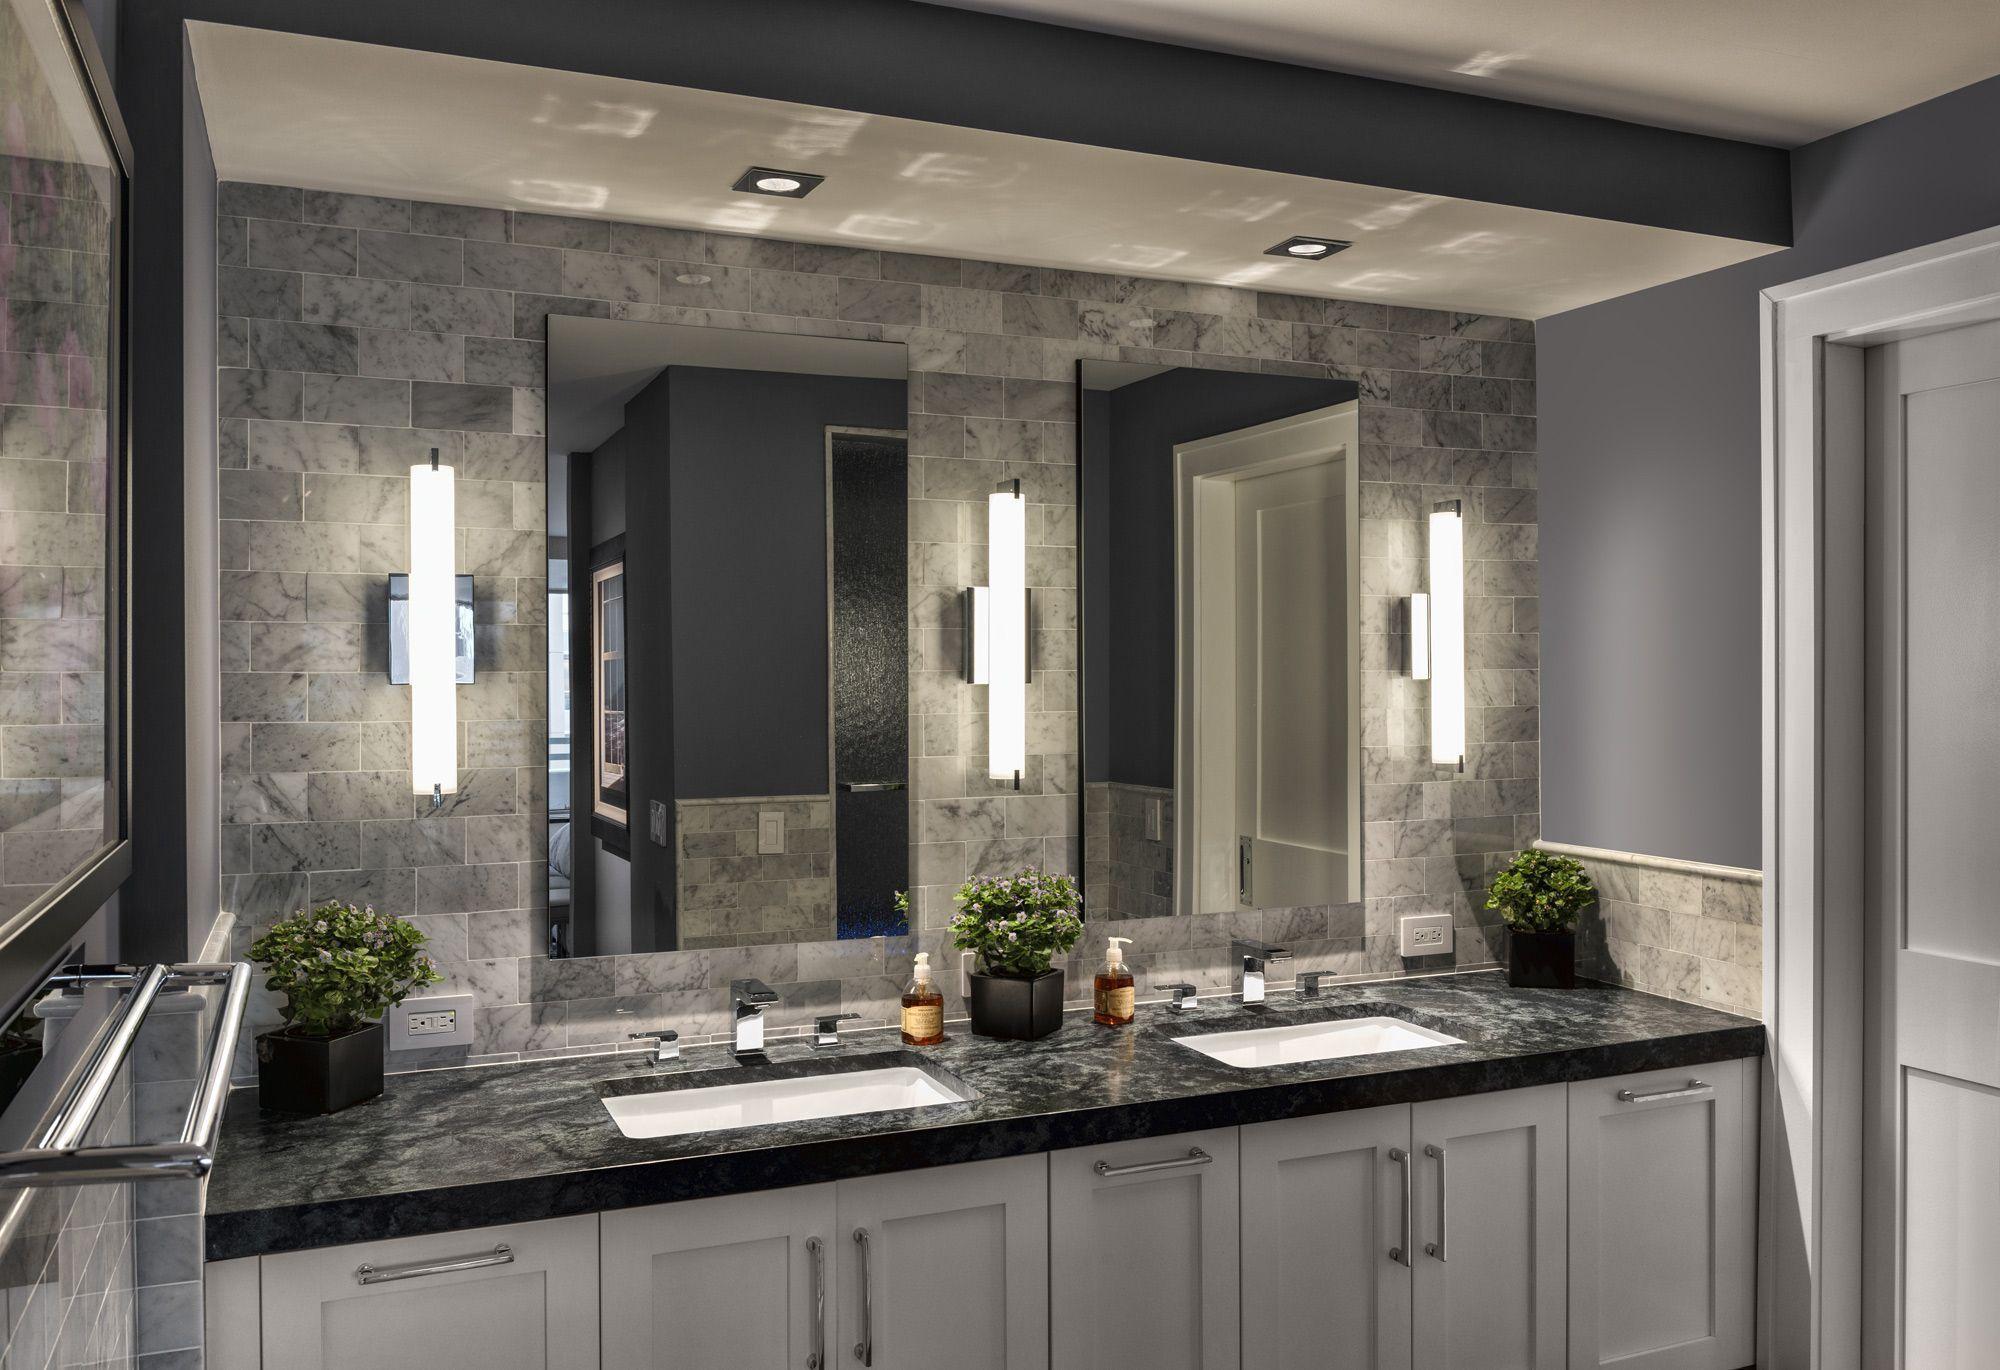 Tube Led Bath Bar George Kovacs At Lightology Bathroom Layout Bathroom Remodel Master Dream Bathrooms